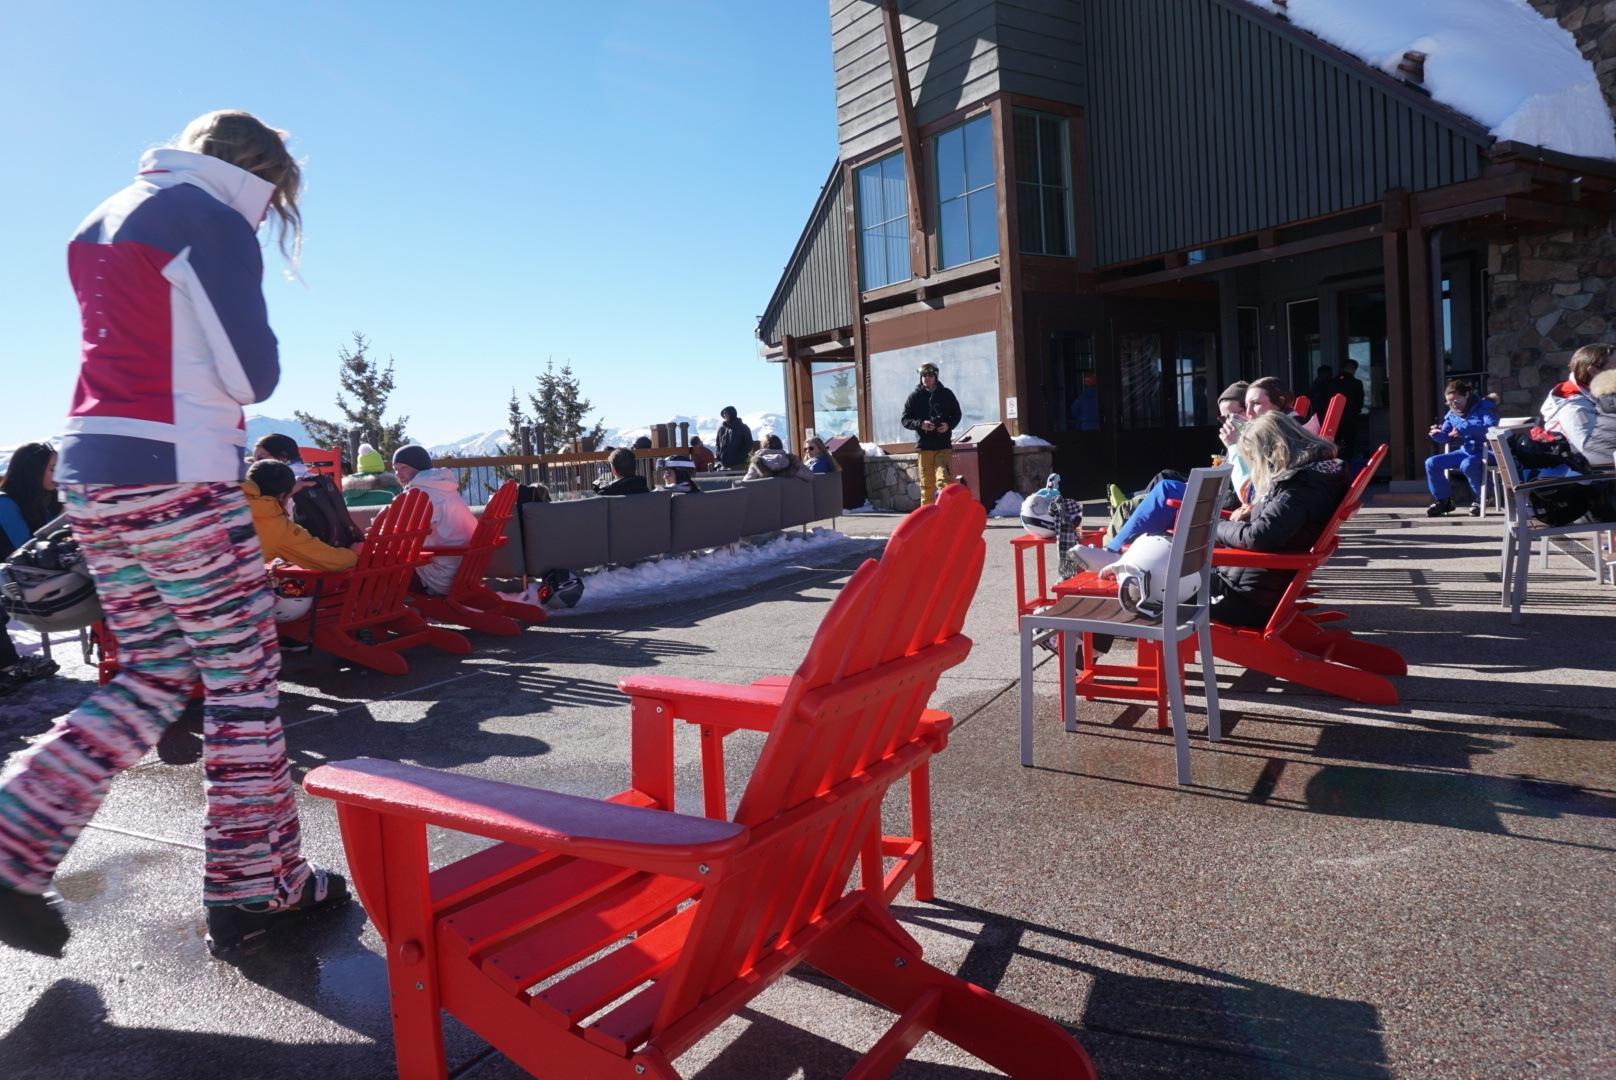 skiwear aspen slopes what to wear